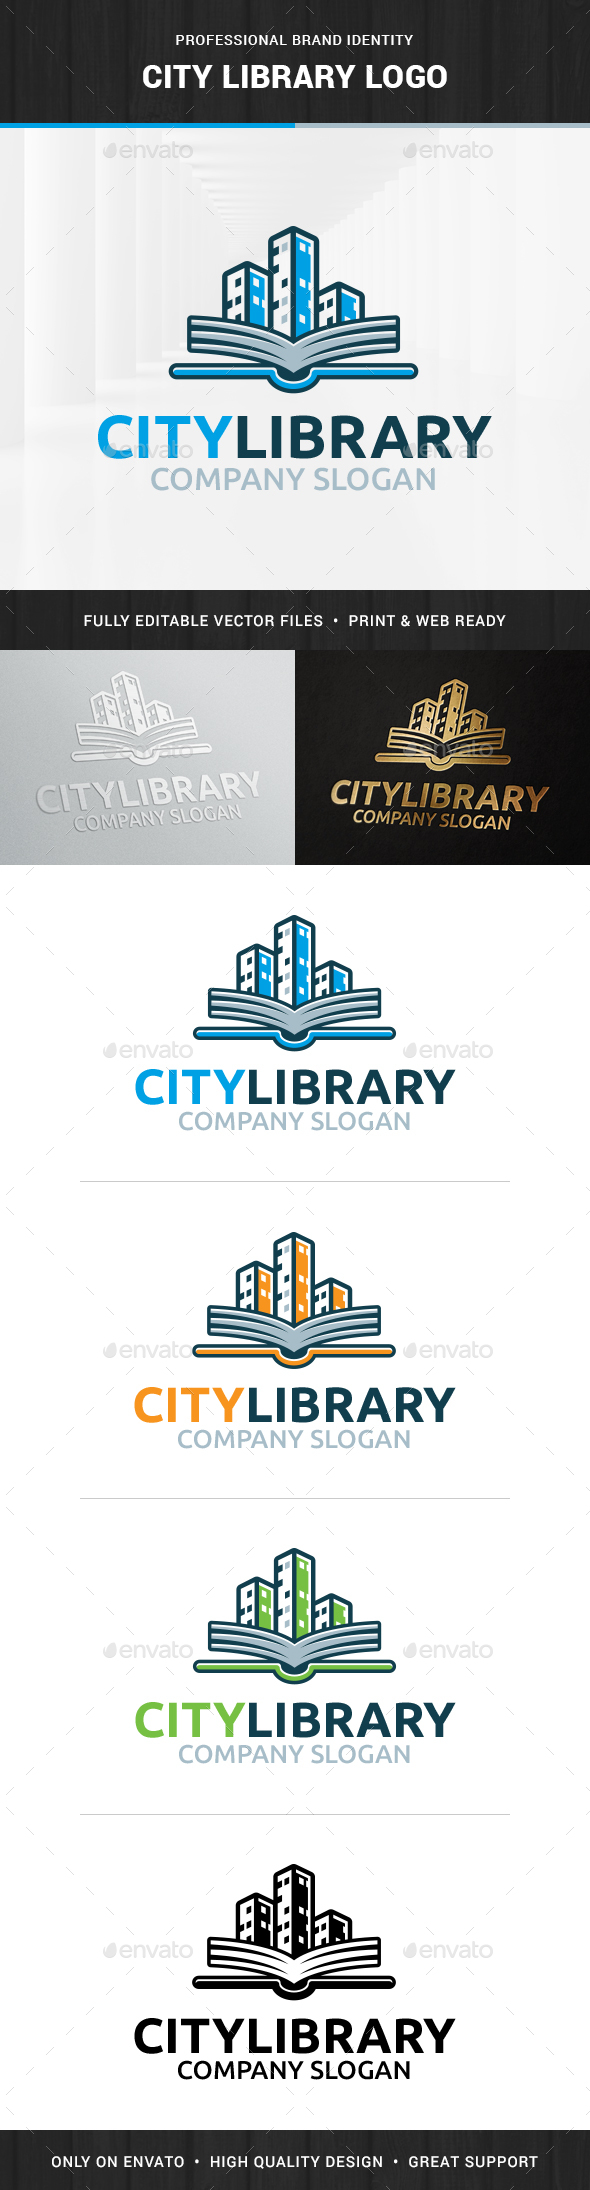 City Library Logo Template - Buildings Logo Templates